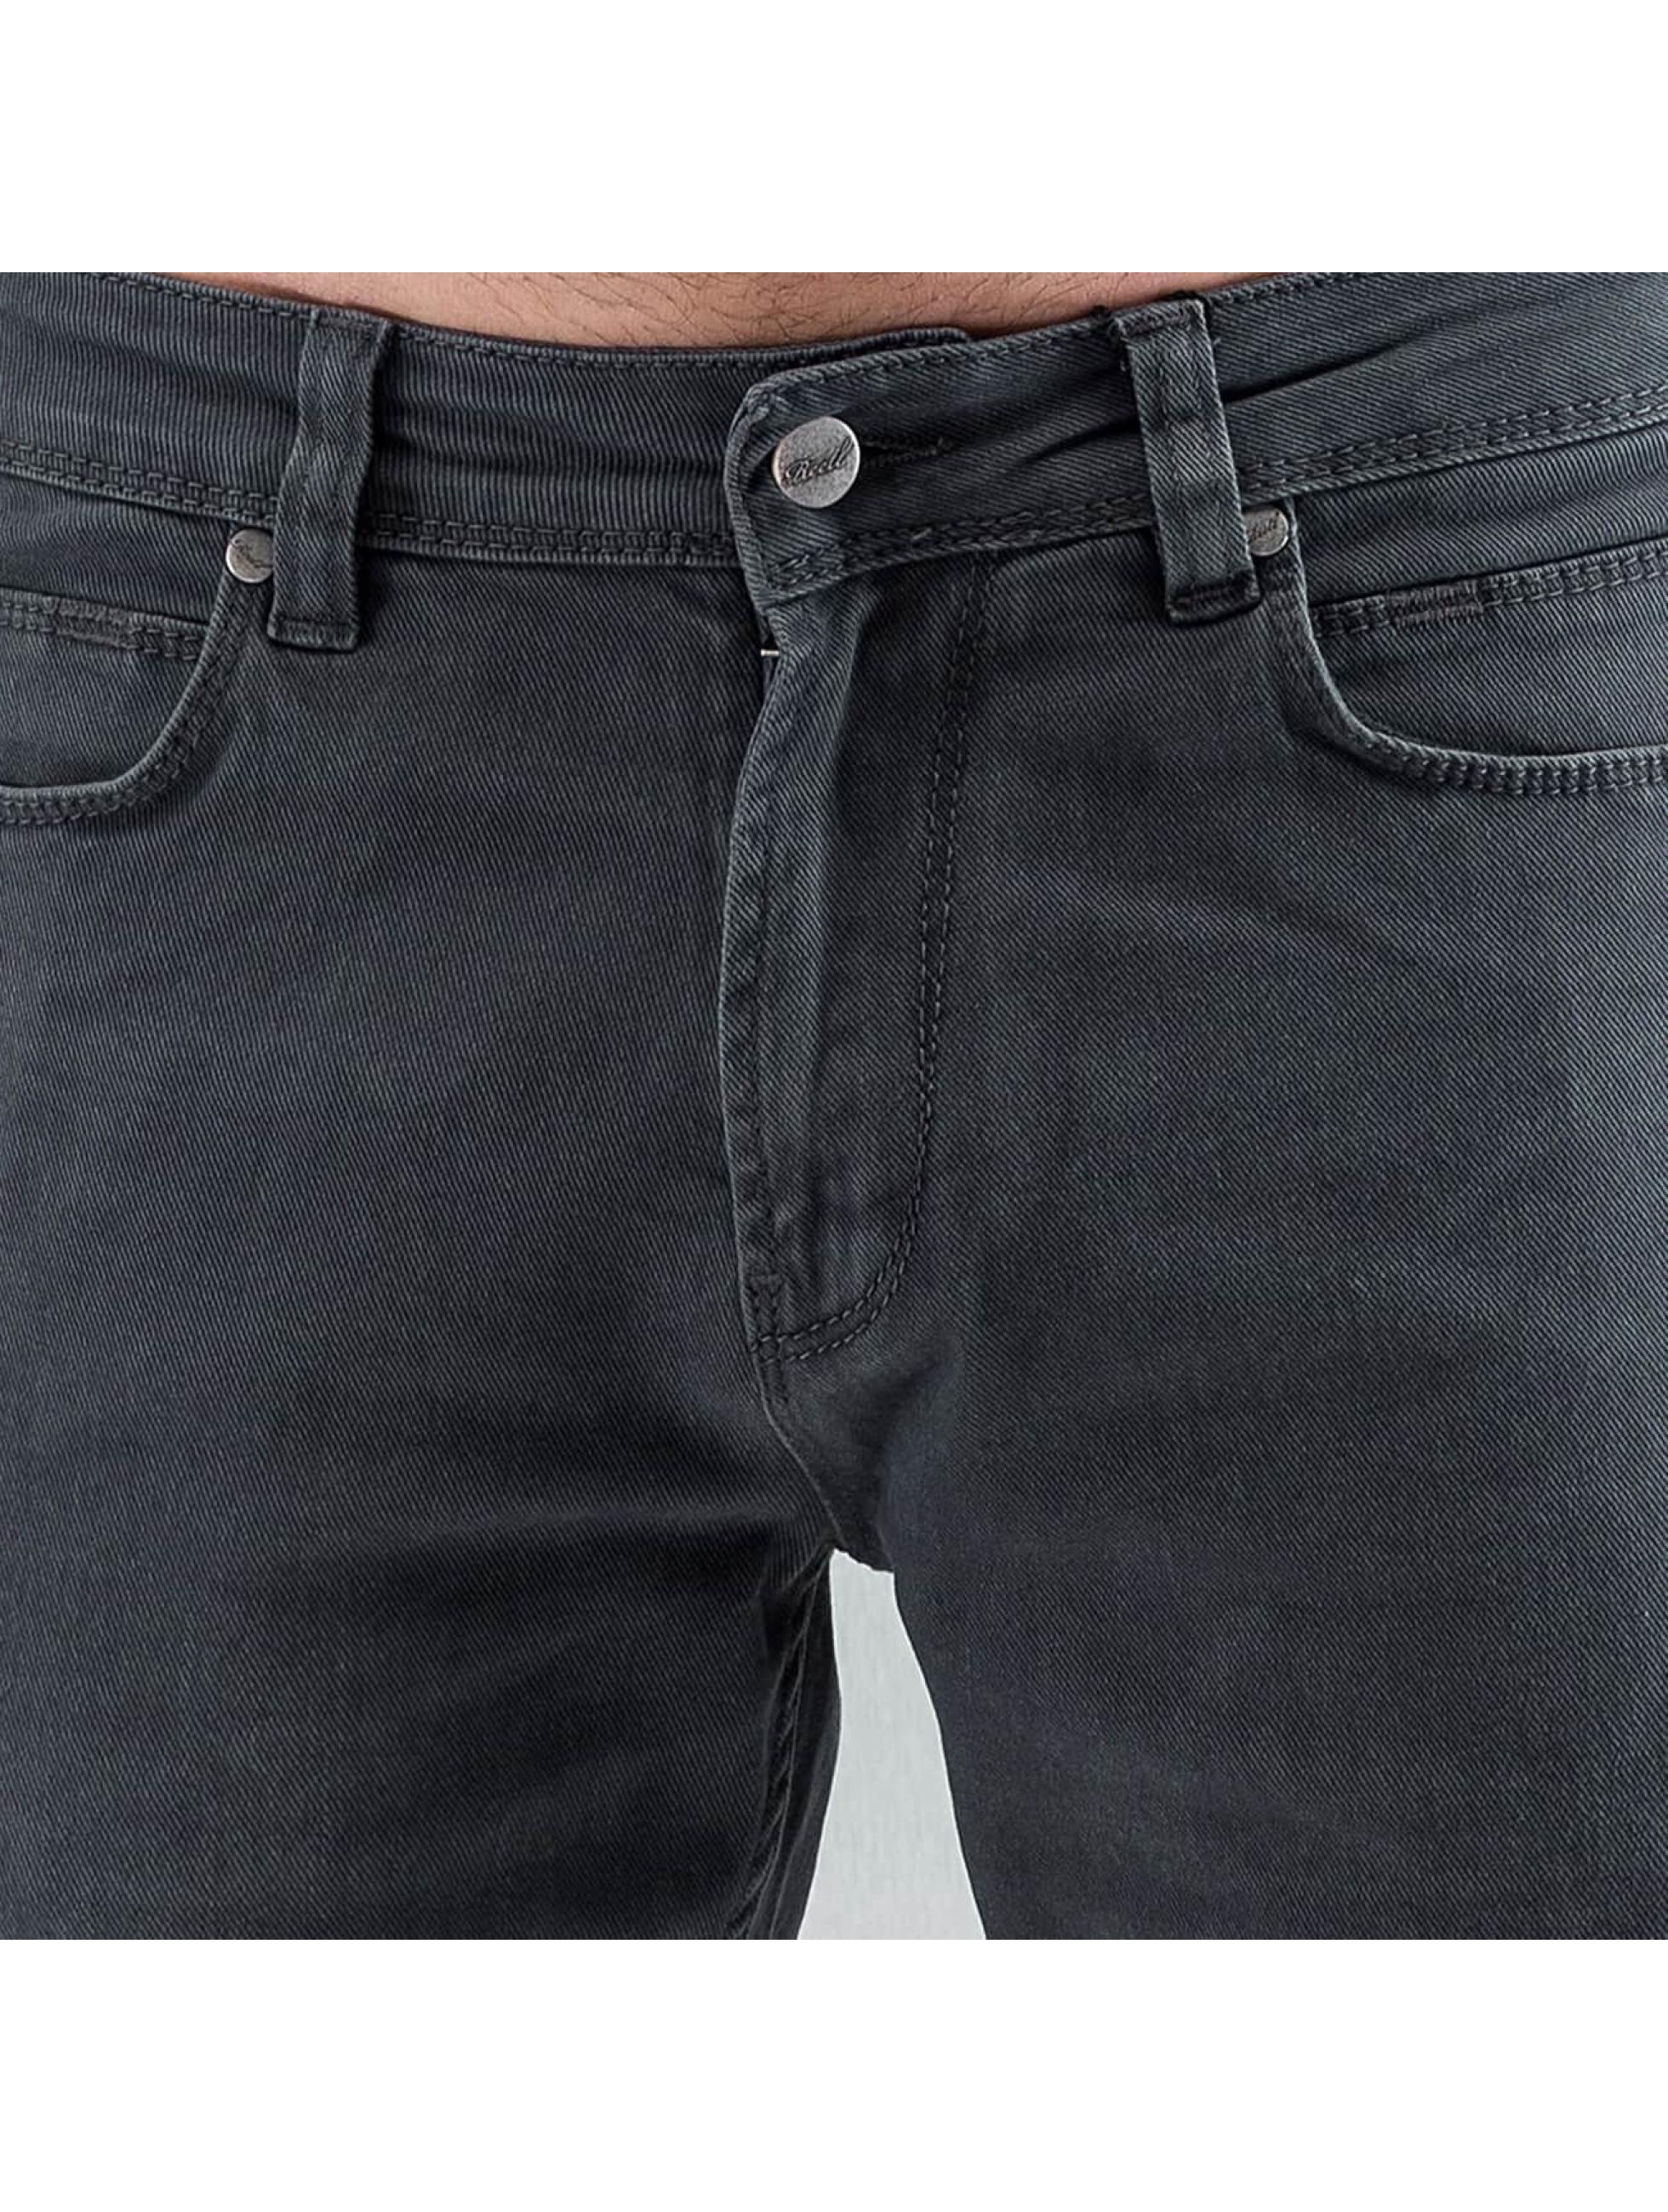 Reell Jeans Джинсы прямого покроя Razor II серый